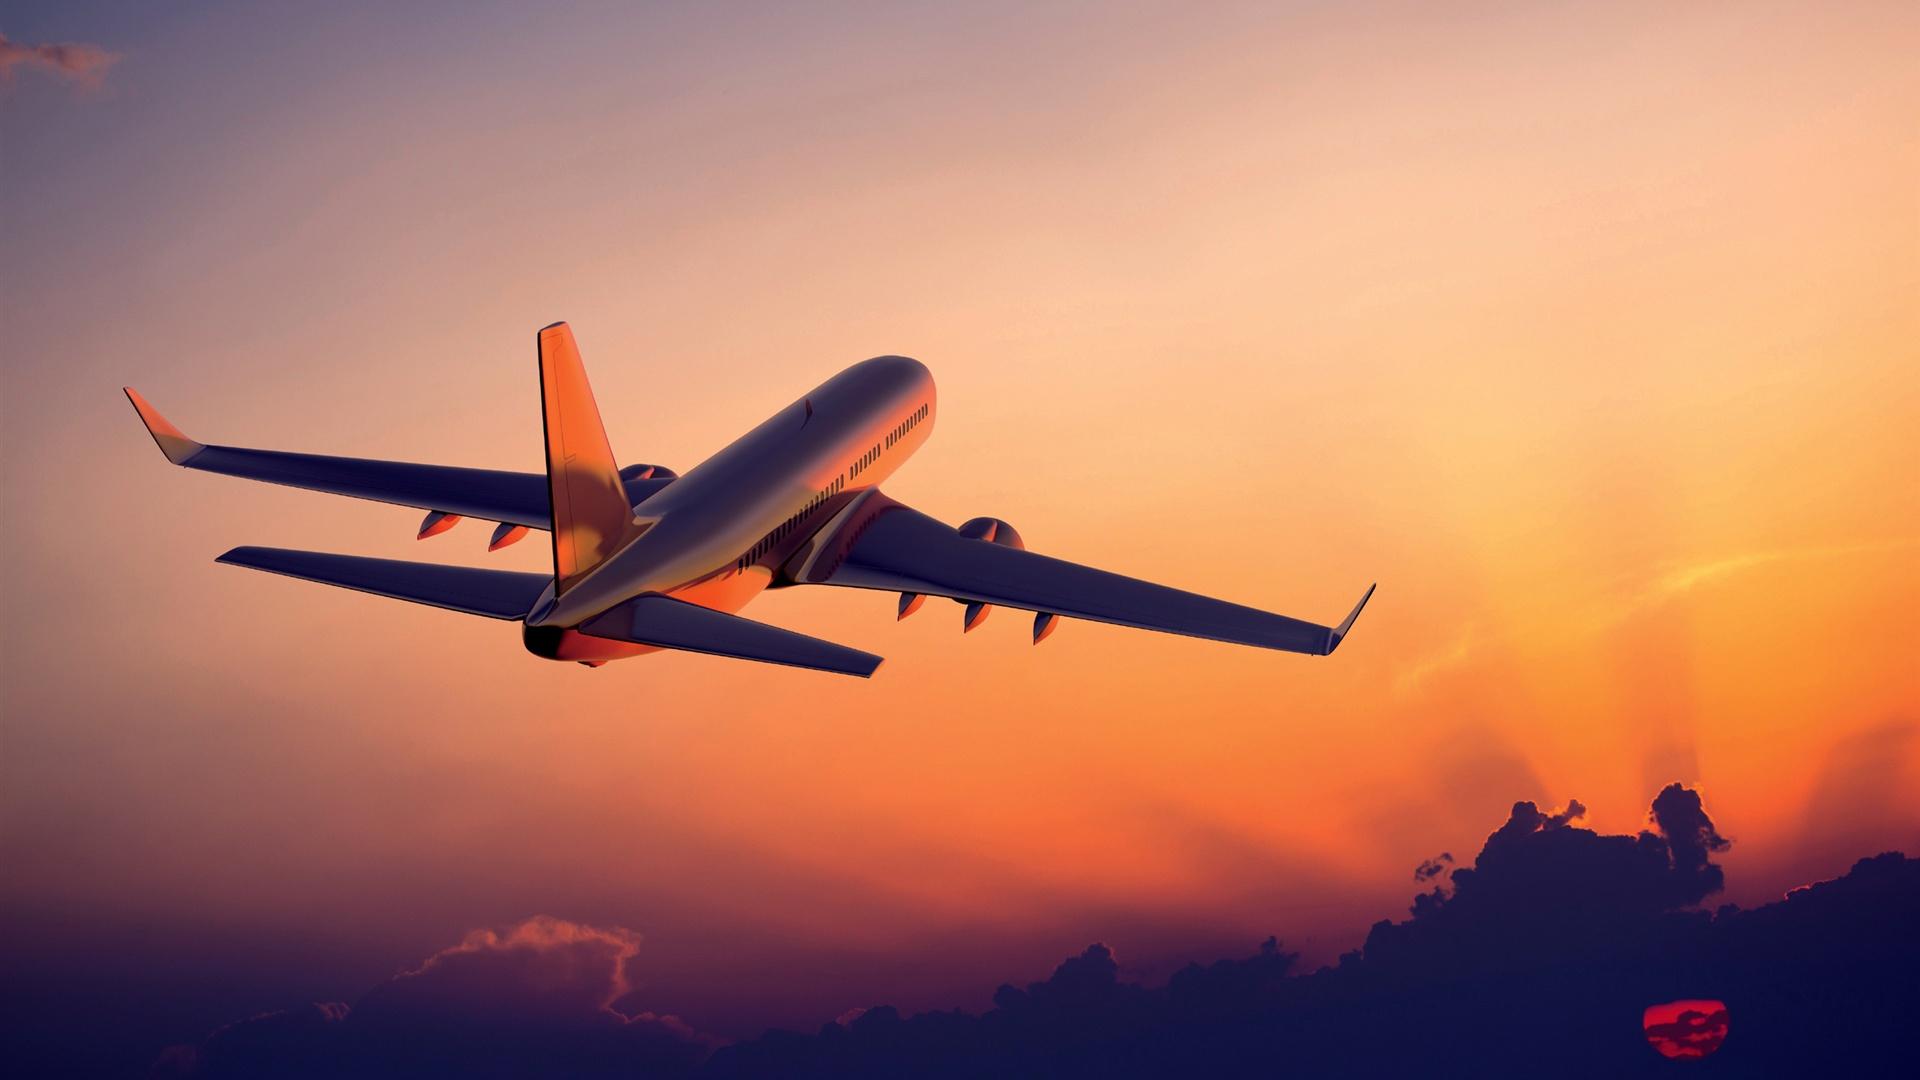 Airplane flight sunset